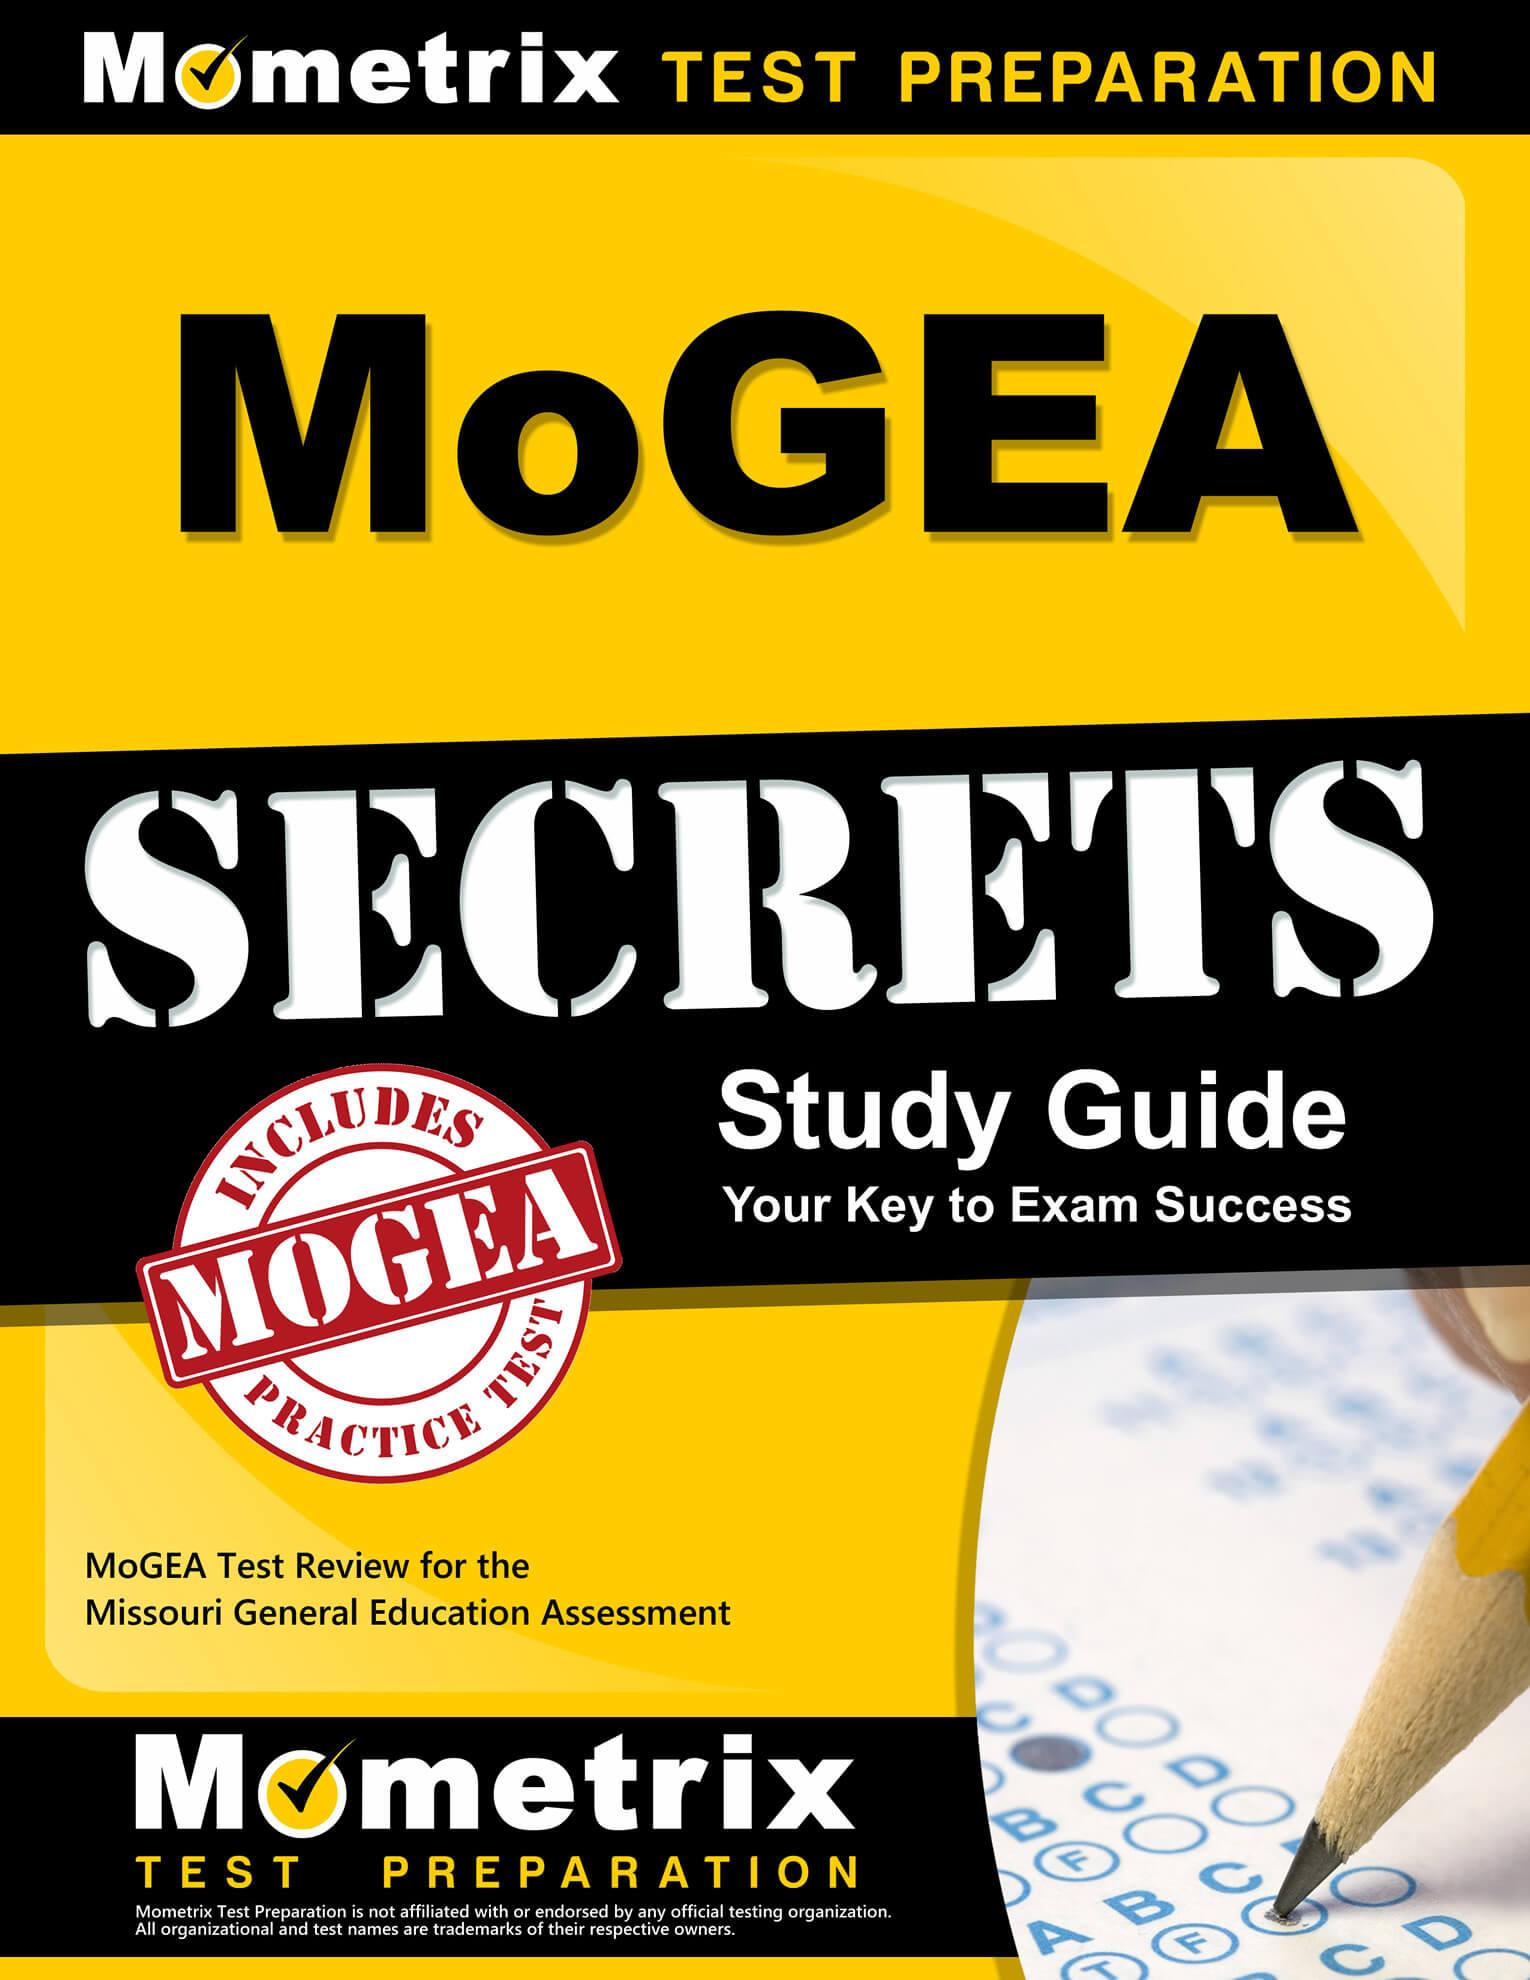 MoGEA Study Guide